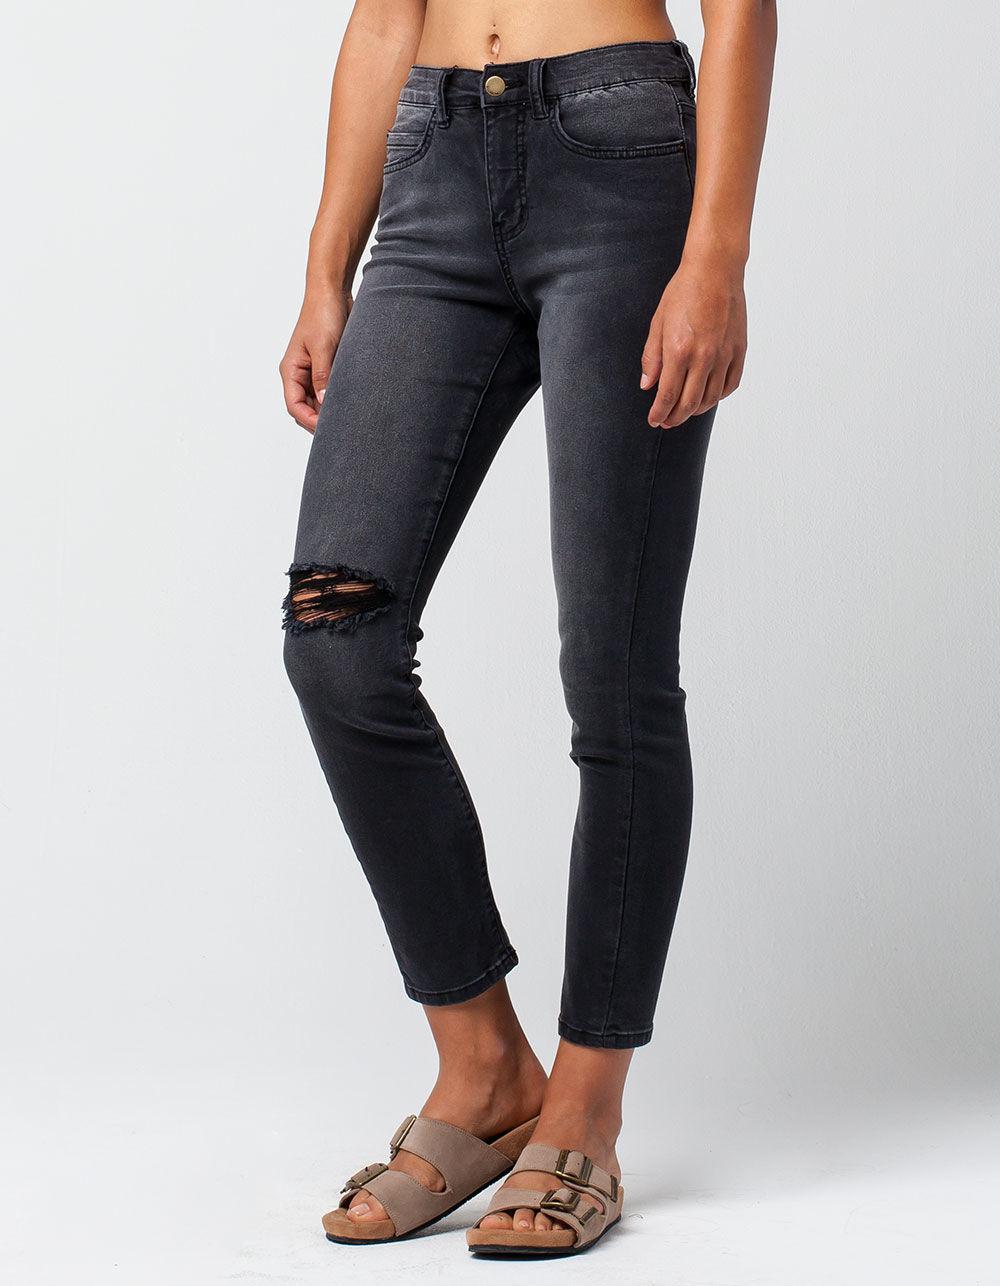 bcdb71a9e384c Billabong Hot Mama Womens Skinny Jeans - Lyst